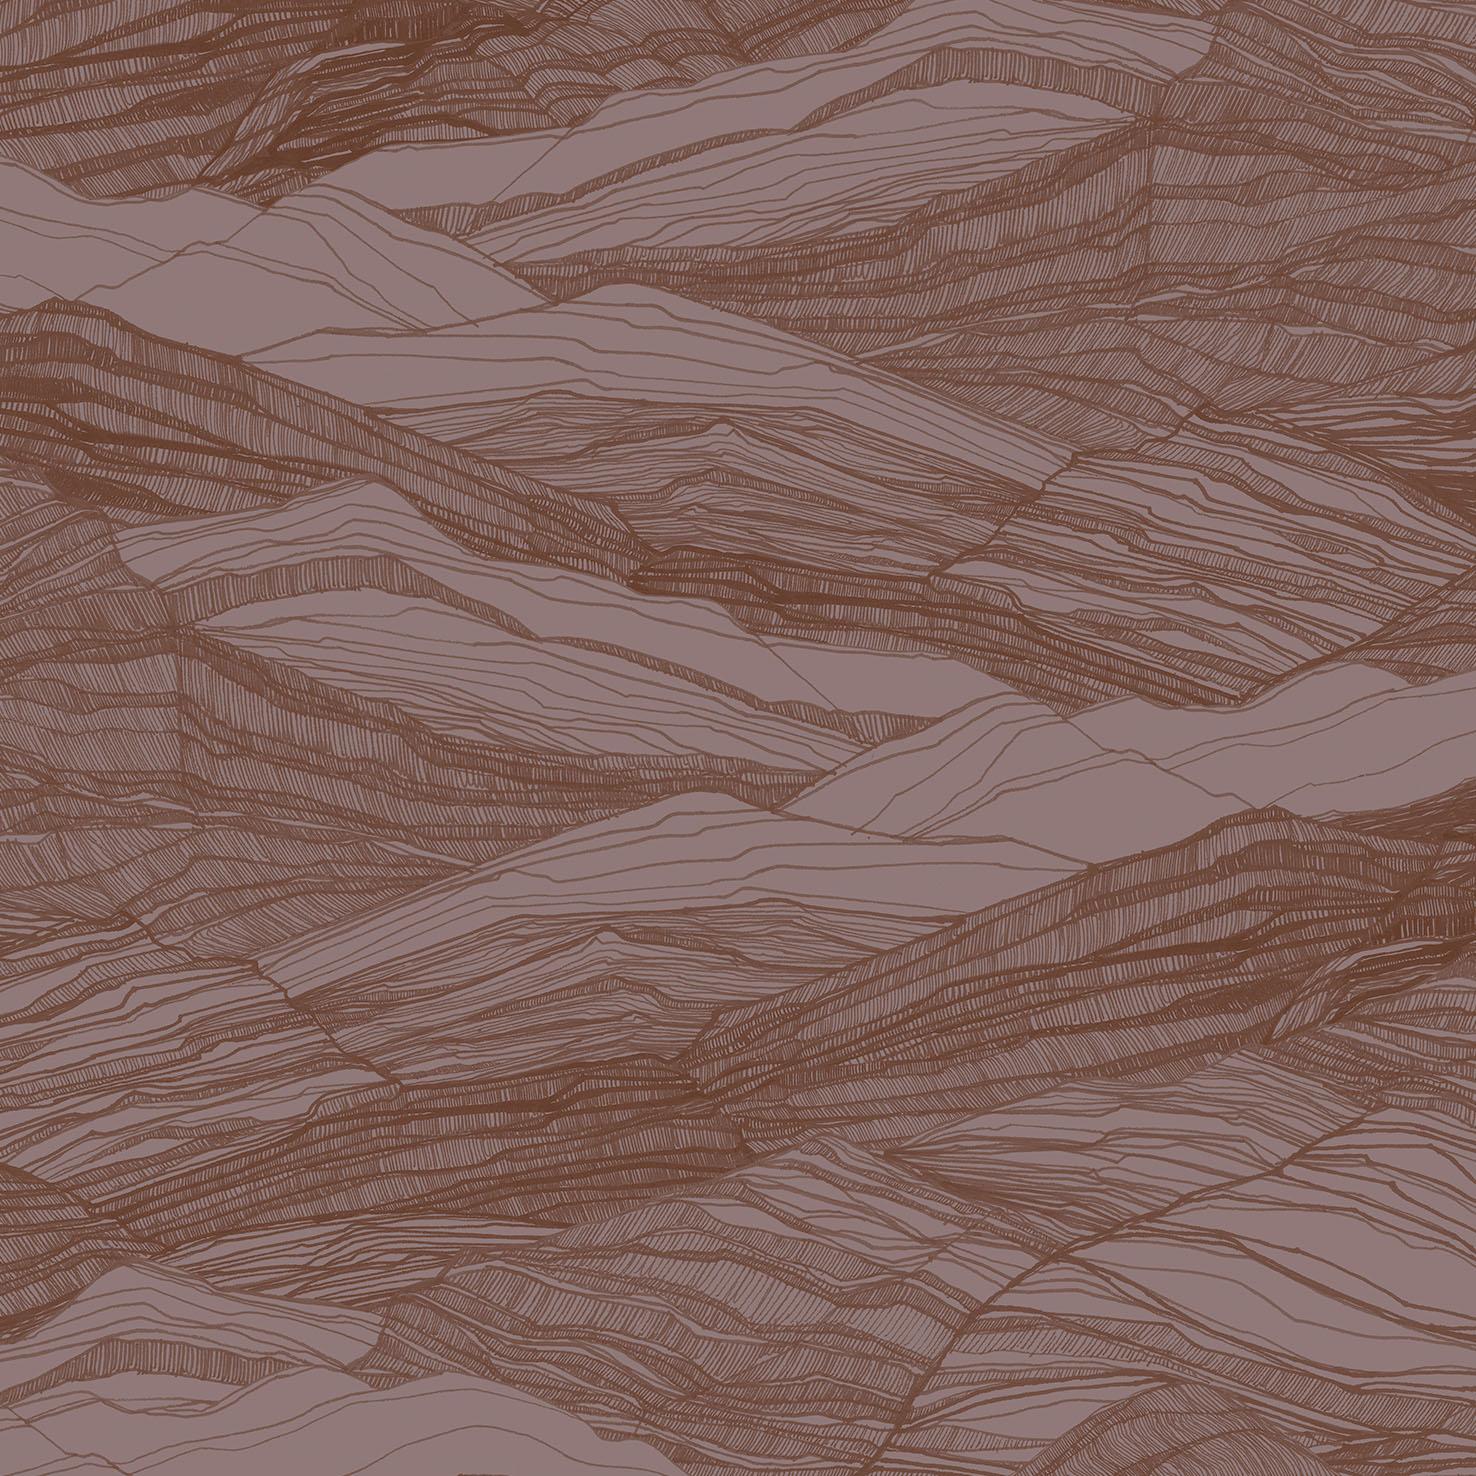 duna clay.jpg